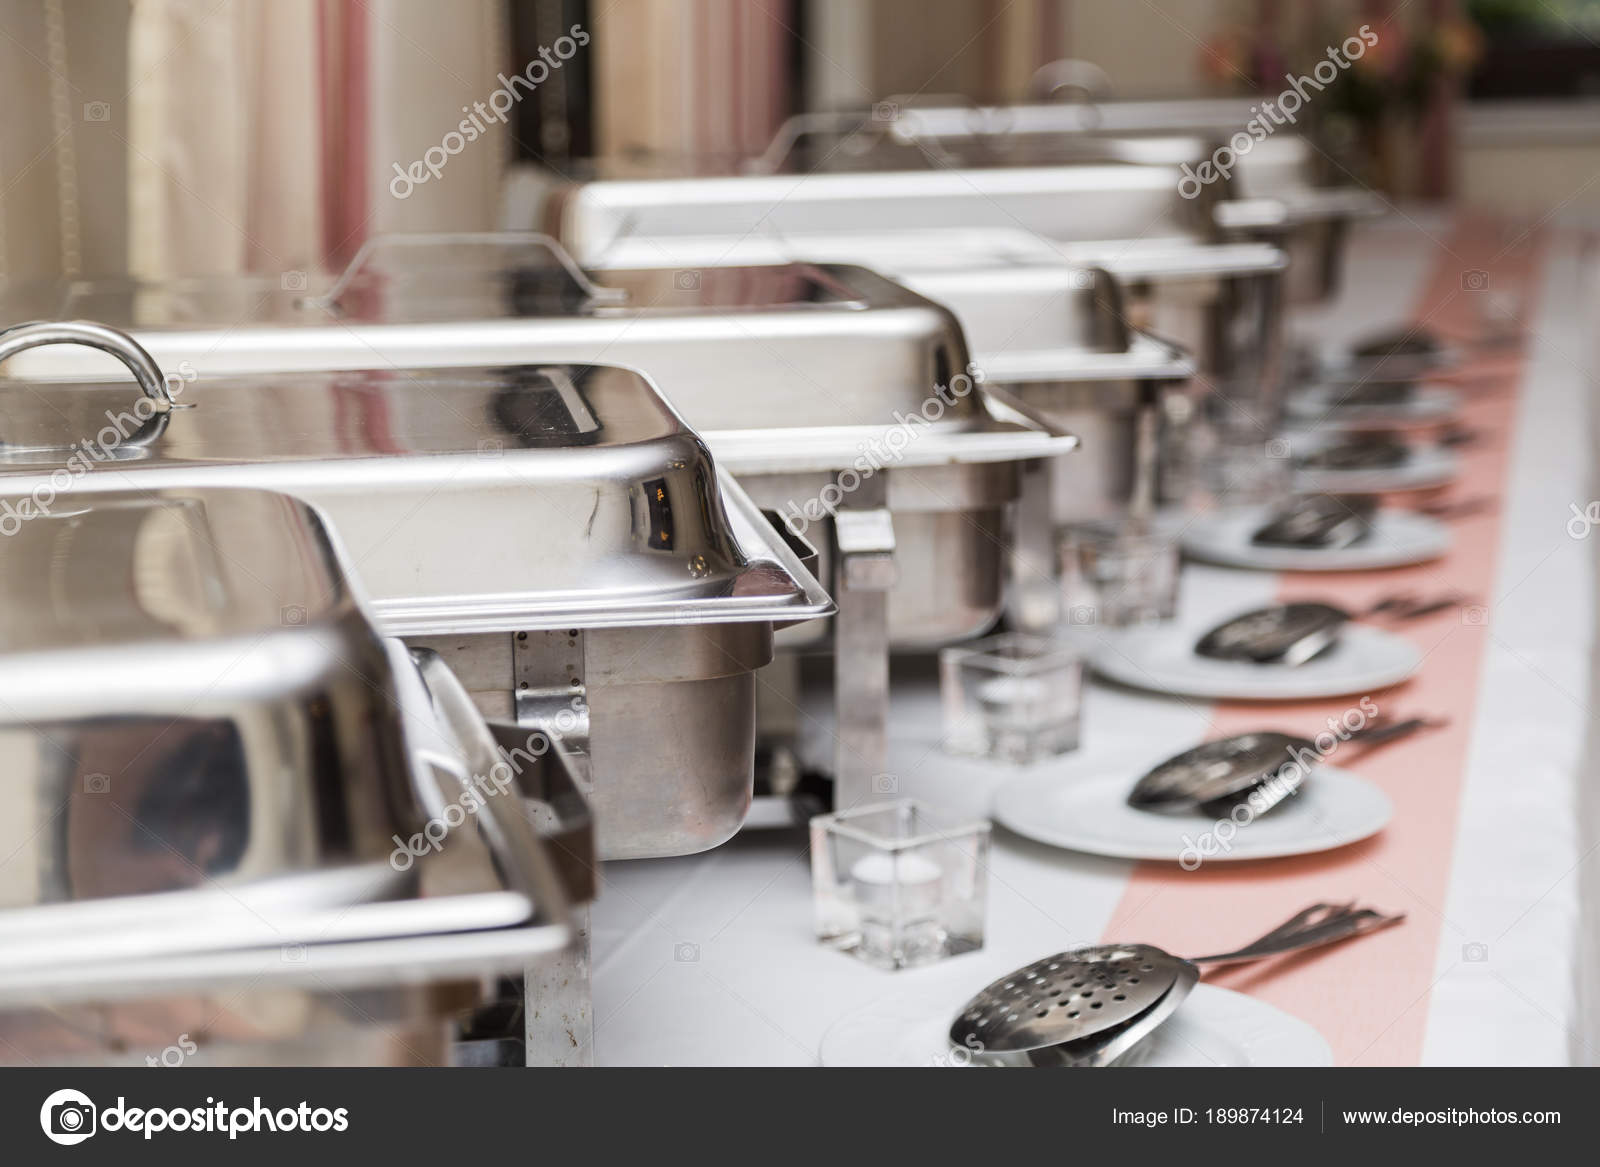 white kitchen buffet cabinet door hinges 许多白色金属清洁现代用具在婚礼自助餐 图库照片 c paulgulea gmail com